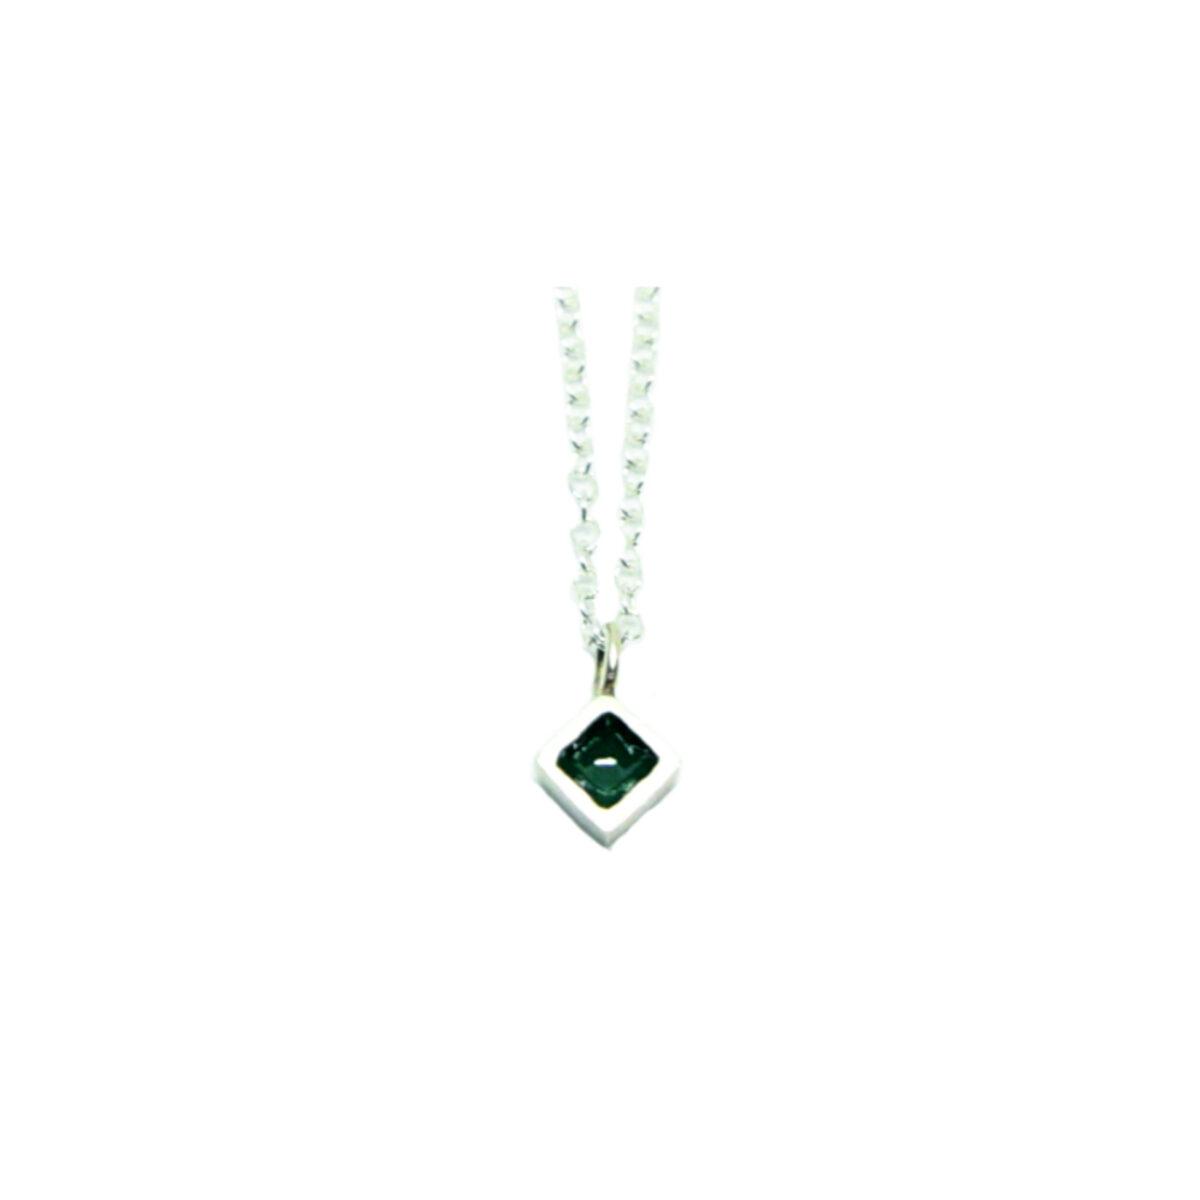 Diamond II silver necklace